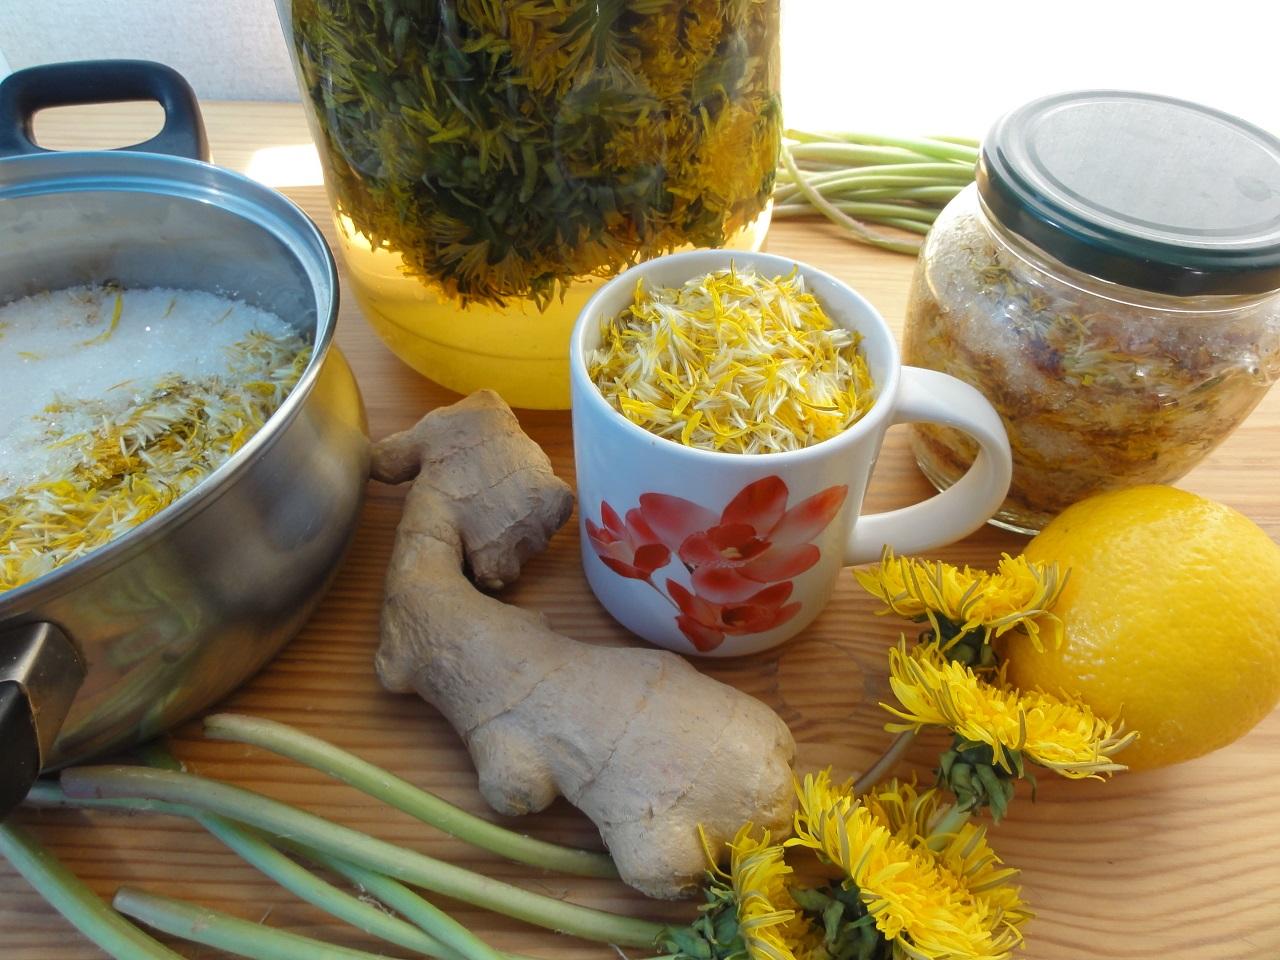 Herbal-tea-green-tea-fruit-tea-cups-with-honey-and-cookies-on-grey-background